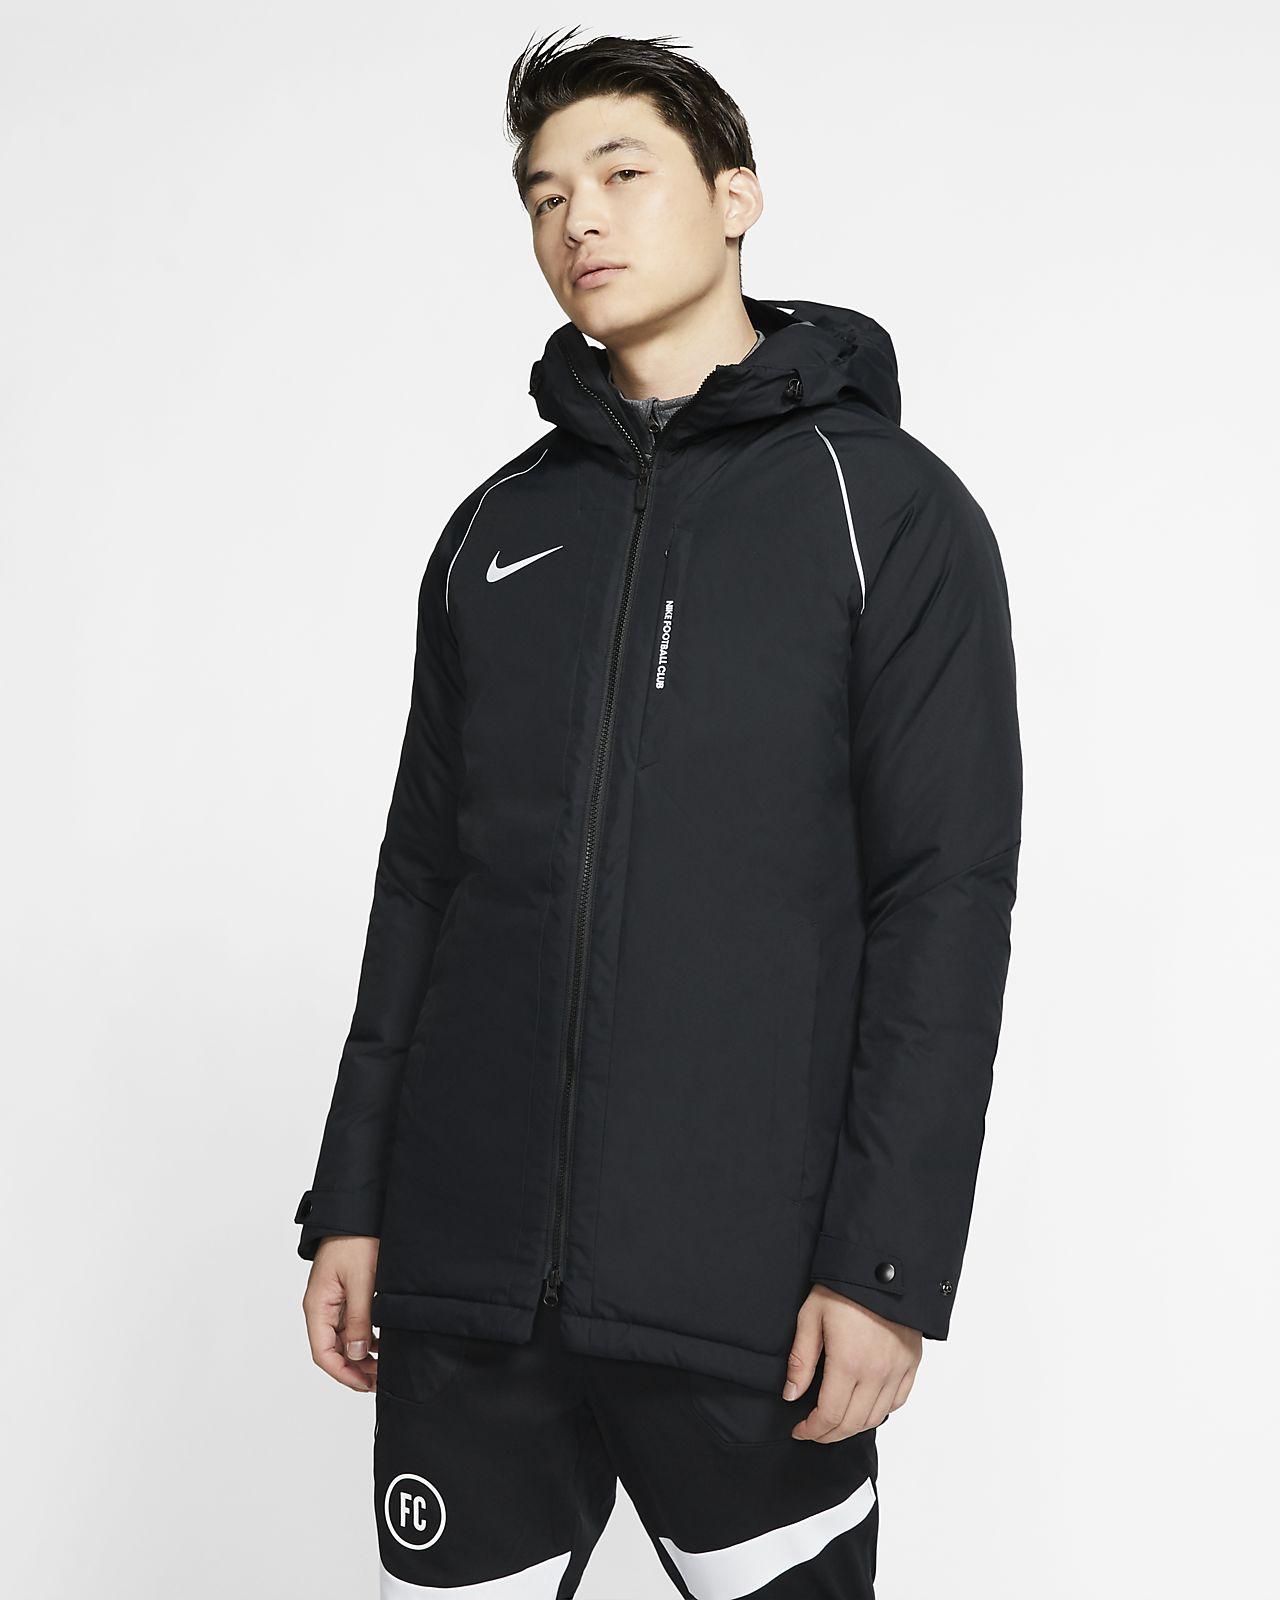 Nike F.C. Sideline Men's Jacket